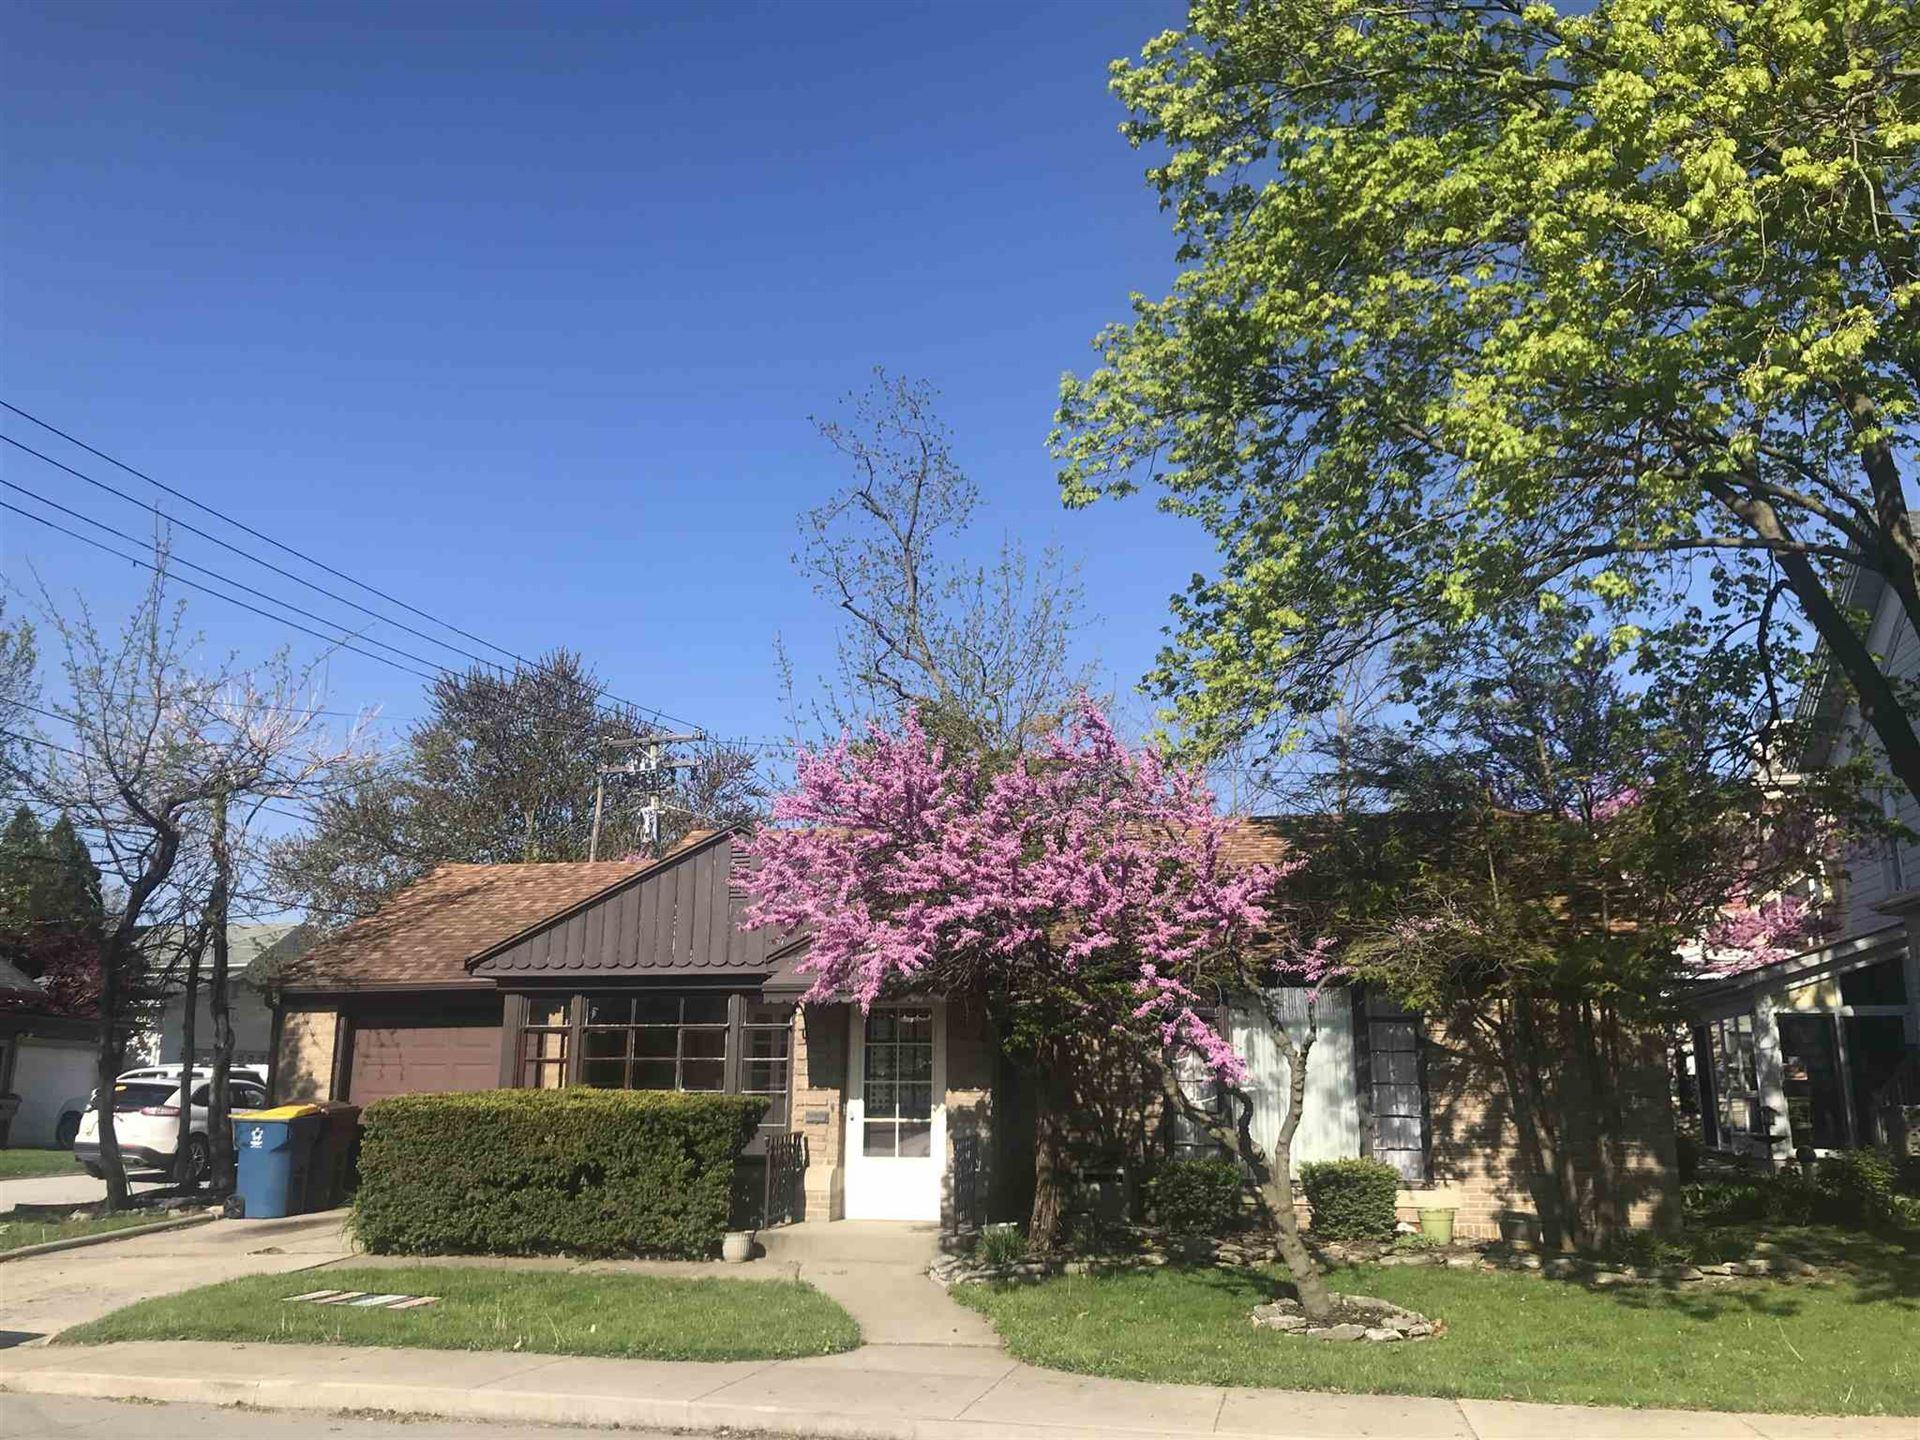 108 S Williams Street, Bluffton, IN 46714 - #: 201951297